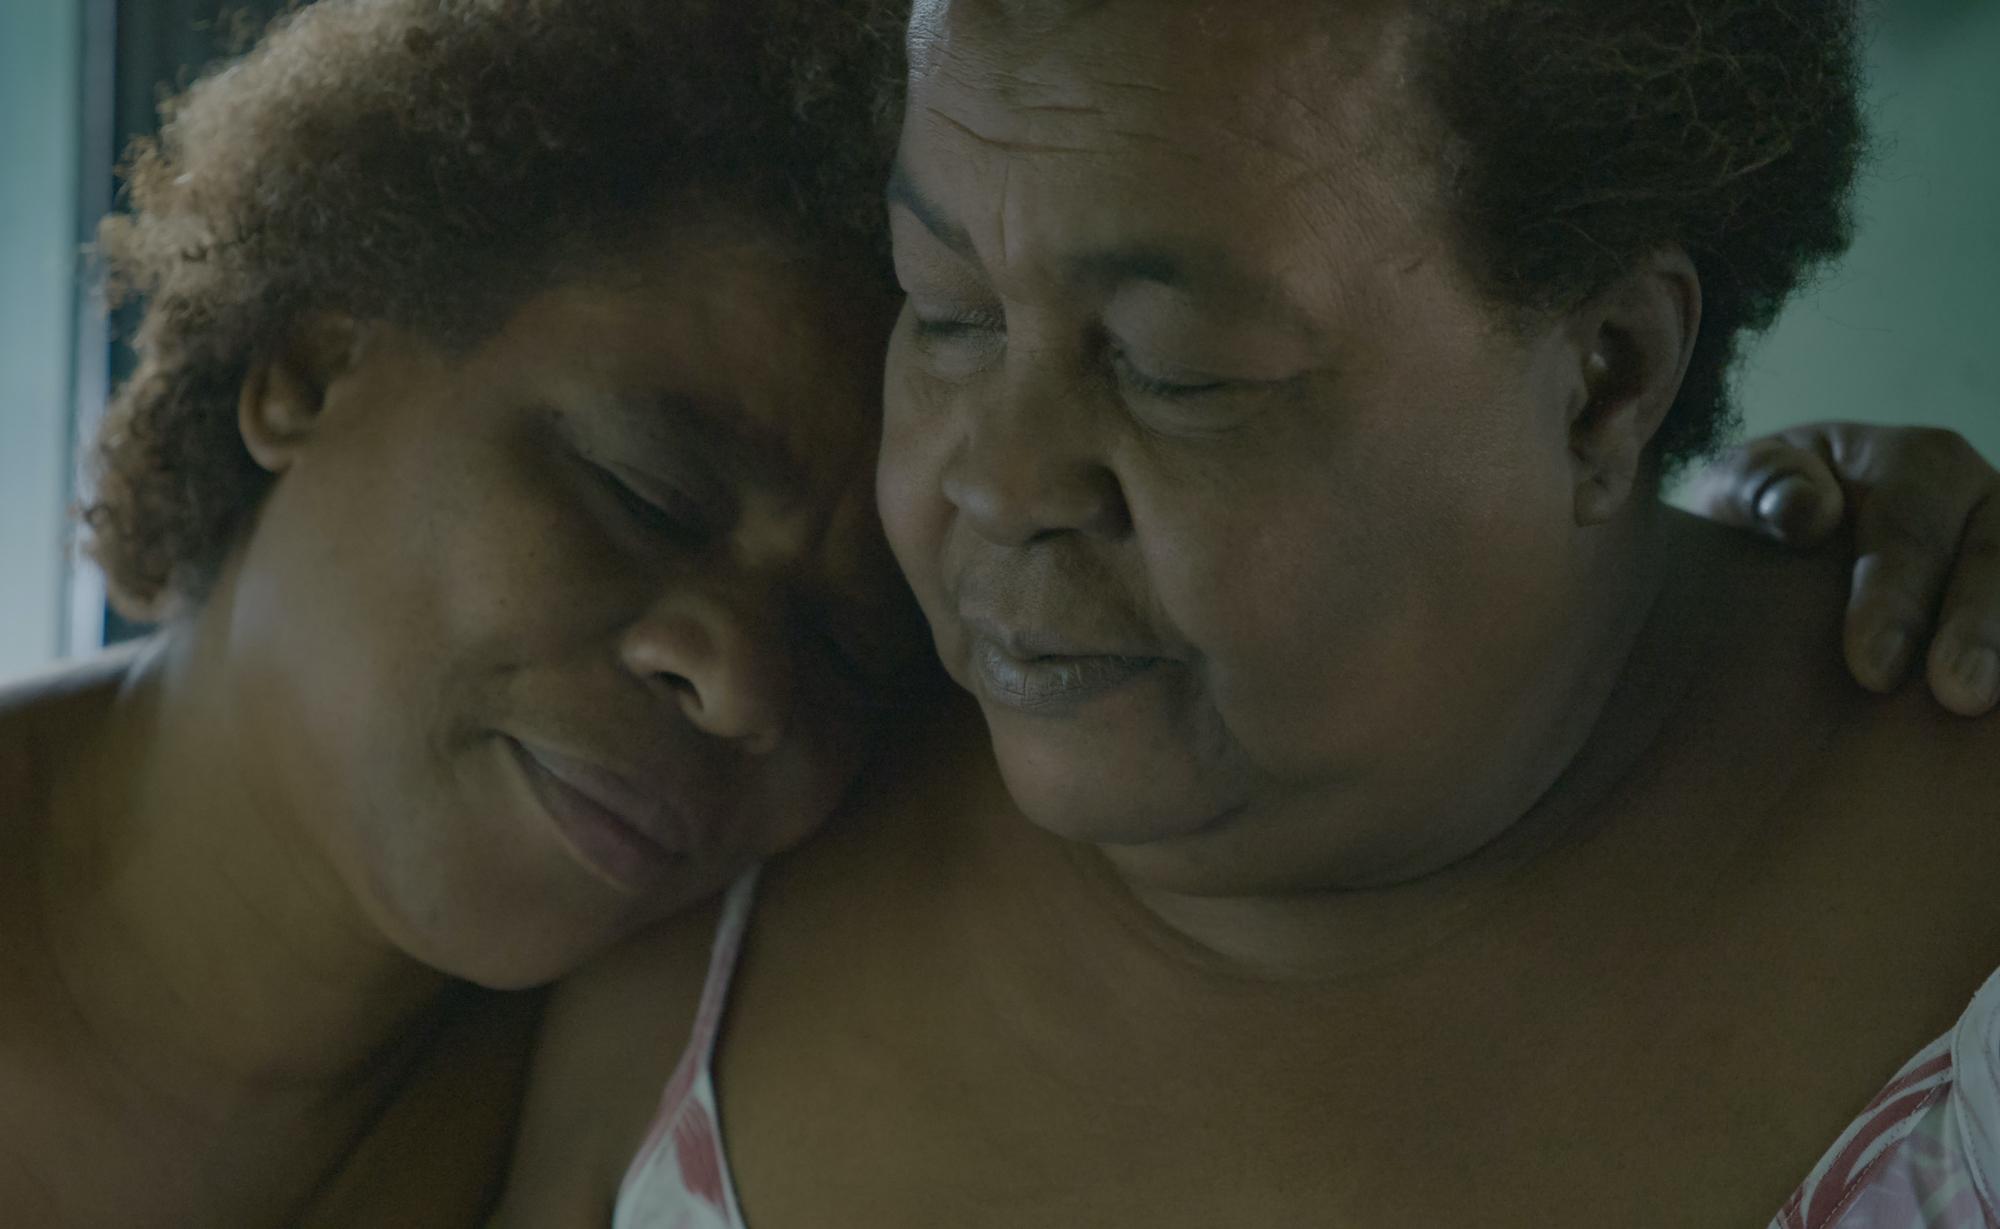 My Love; Six Stories of Love - Nicinha and Jurema in episode NICINHA & JUREMA from MY LOVE; SIX STORIES OF LOVE. Cr. Courtesy of Netflix/NETFLIX © 2021